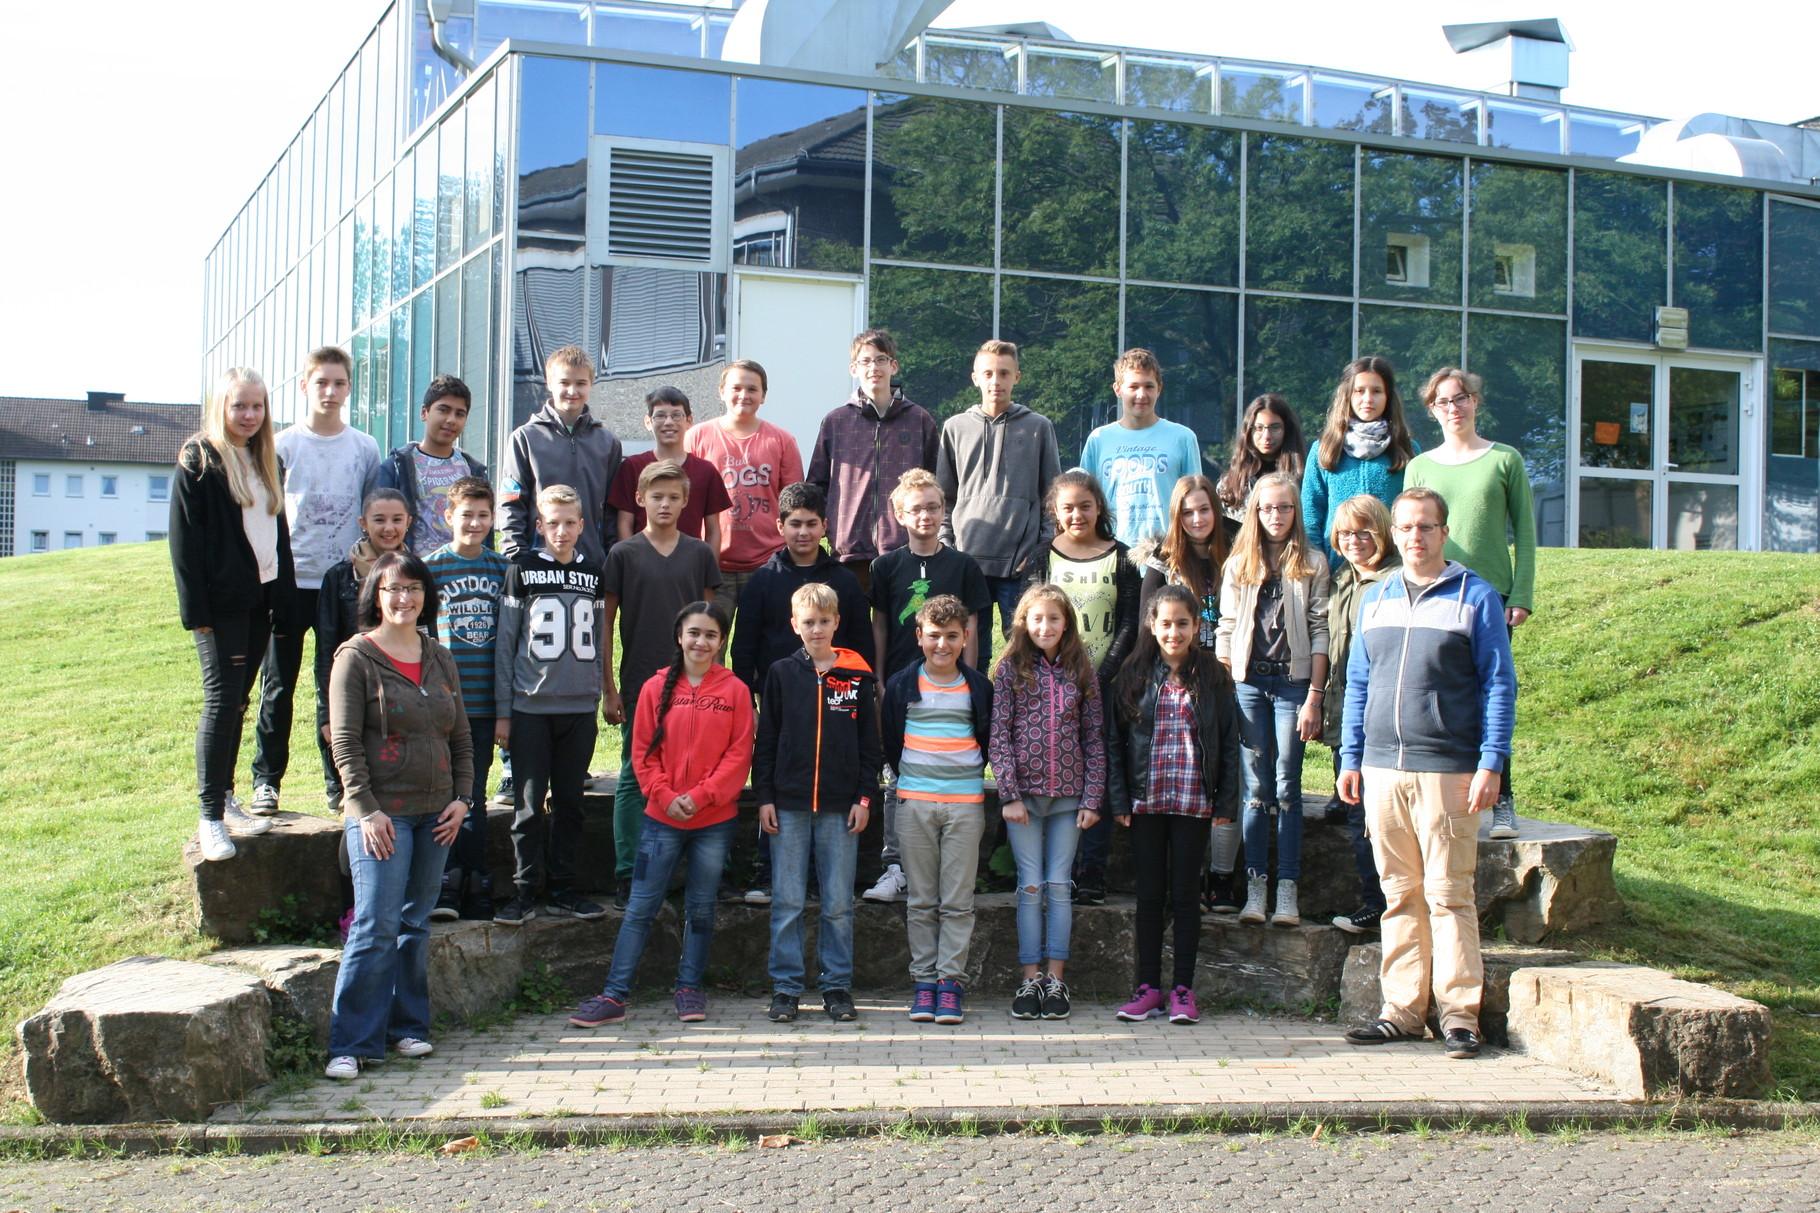 Klasse 6d. Klassenlehrer: Frau Schulz und Herr Womelsdorf